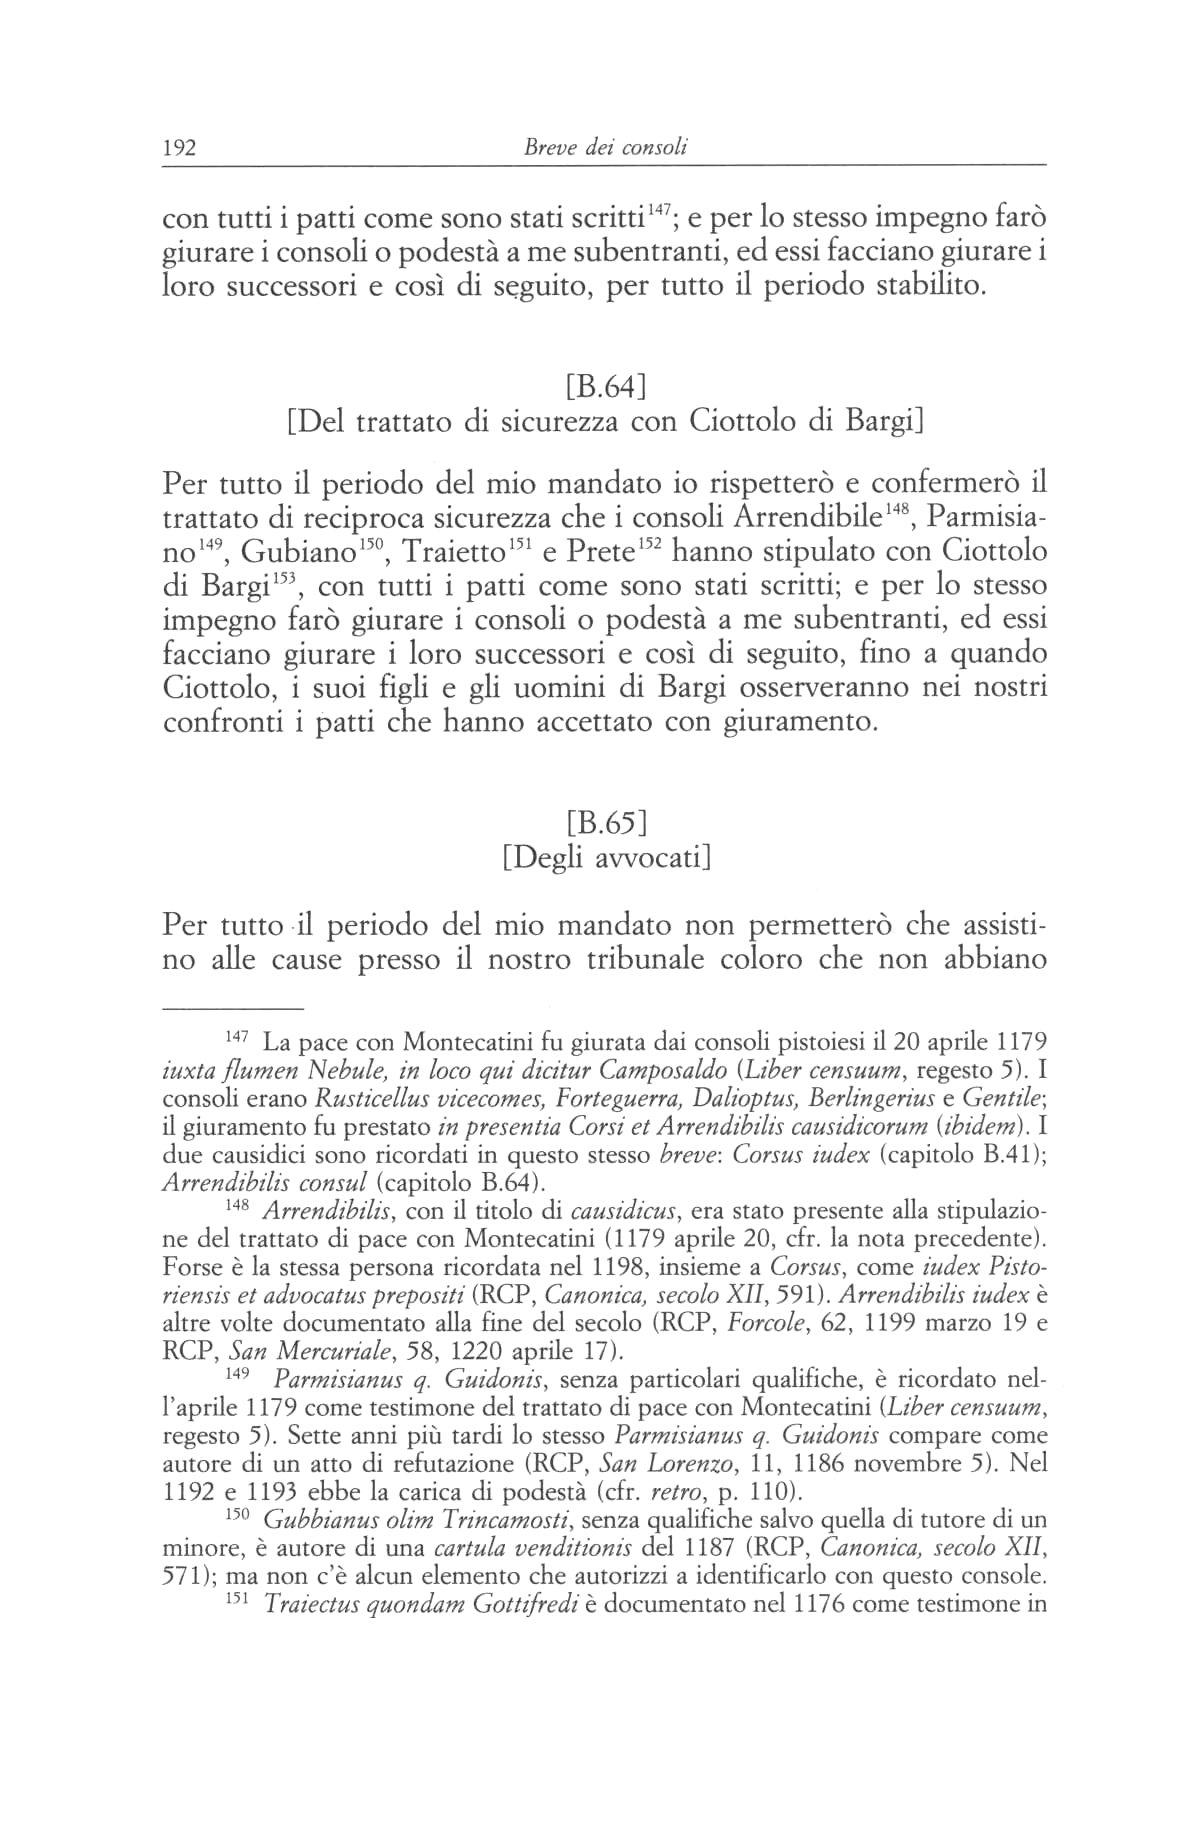 statuti pistoiesi del sec.XII 0192.jpg